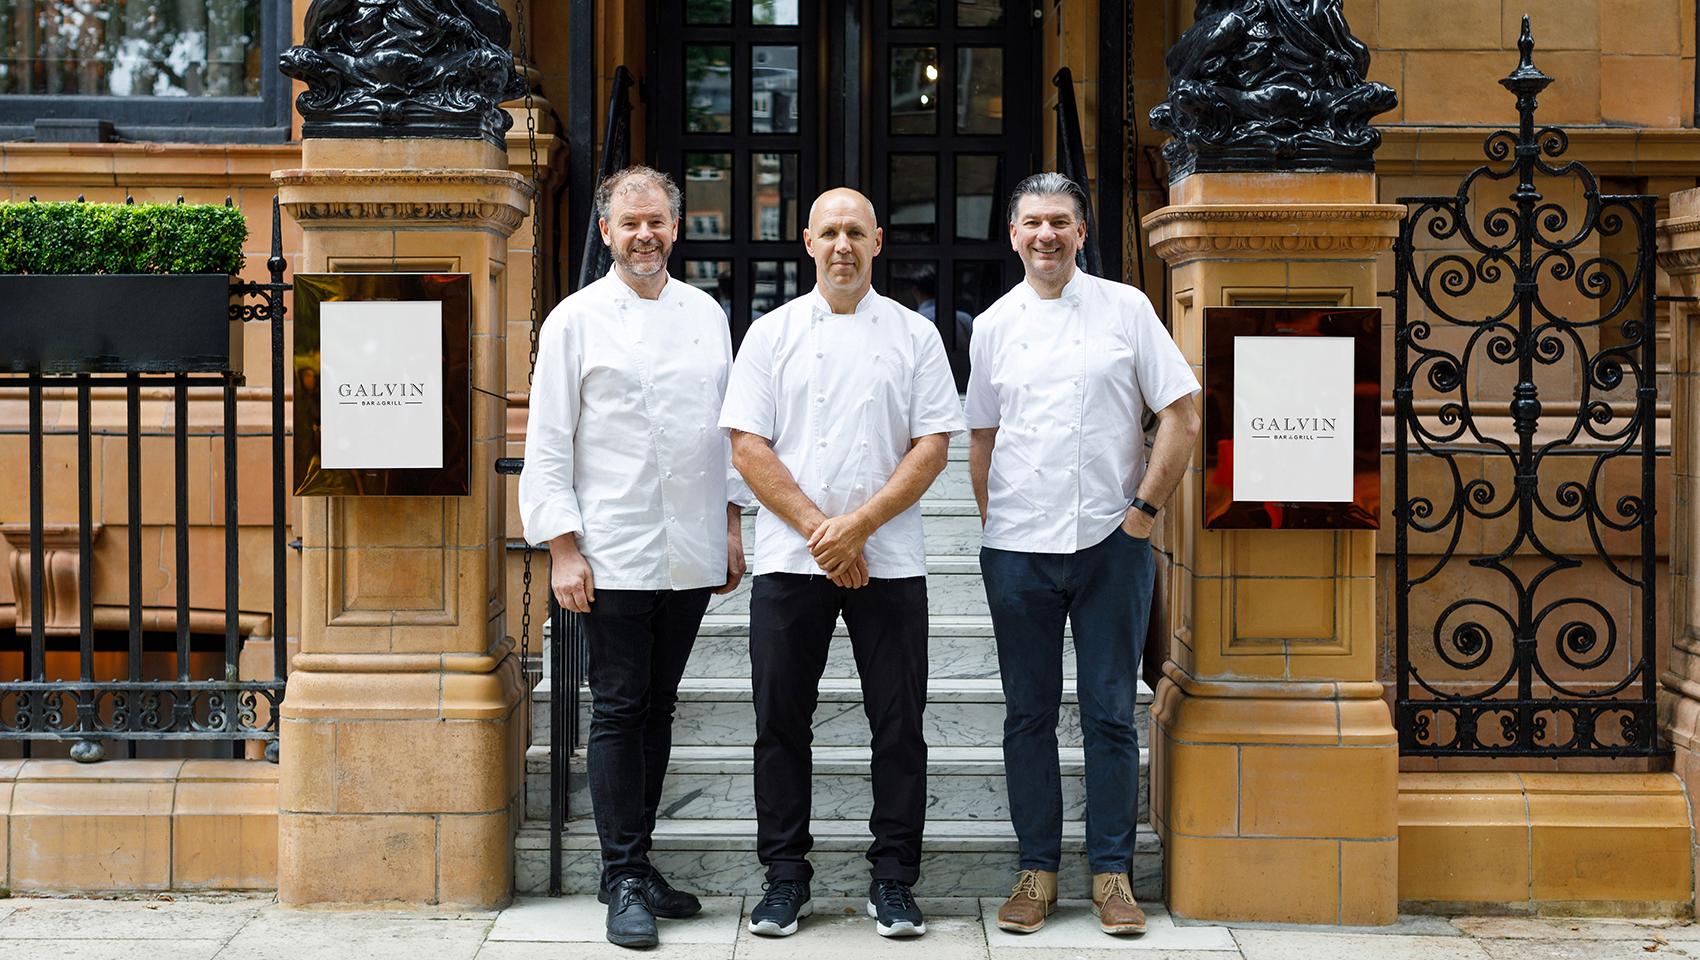 Chris Galvin, Jeff Galvin & Head Chef Adam Gray